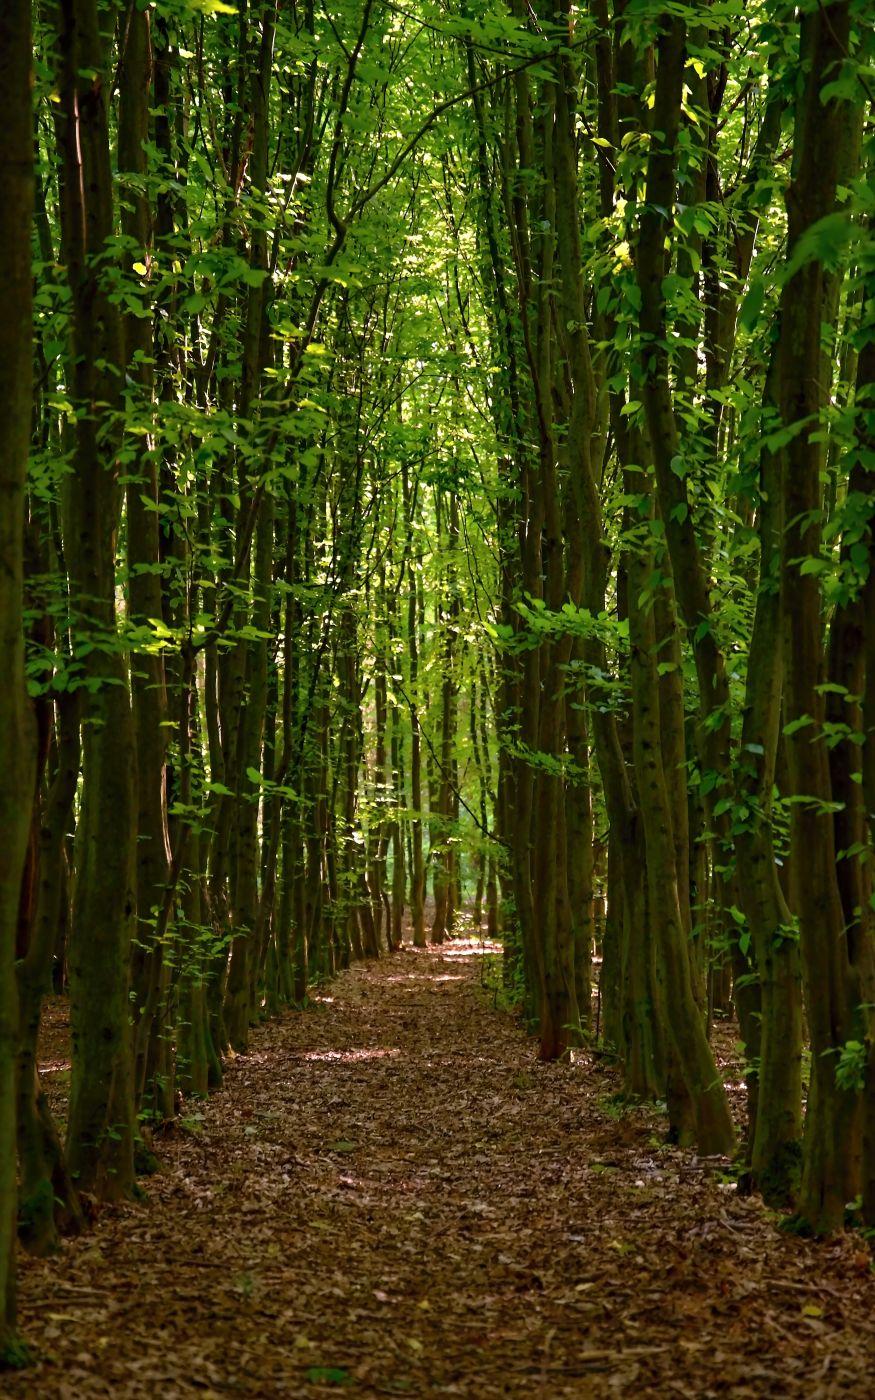 Lined forest, Czech Republic